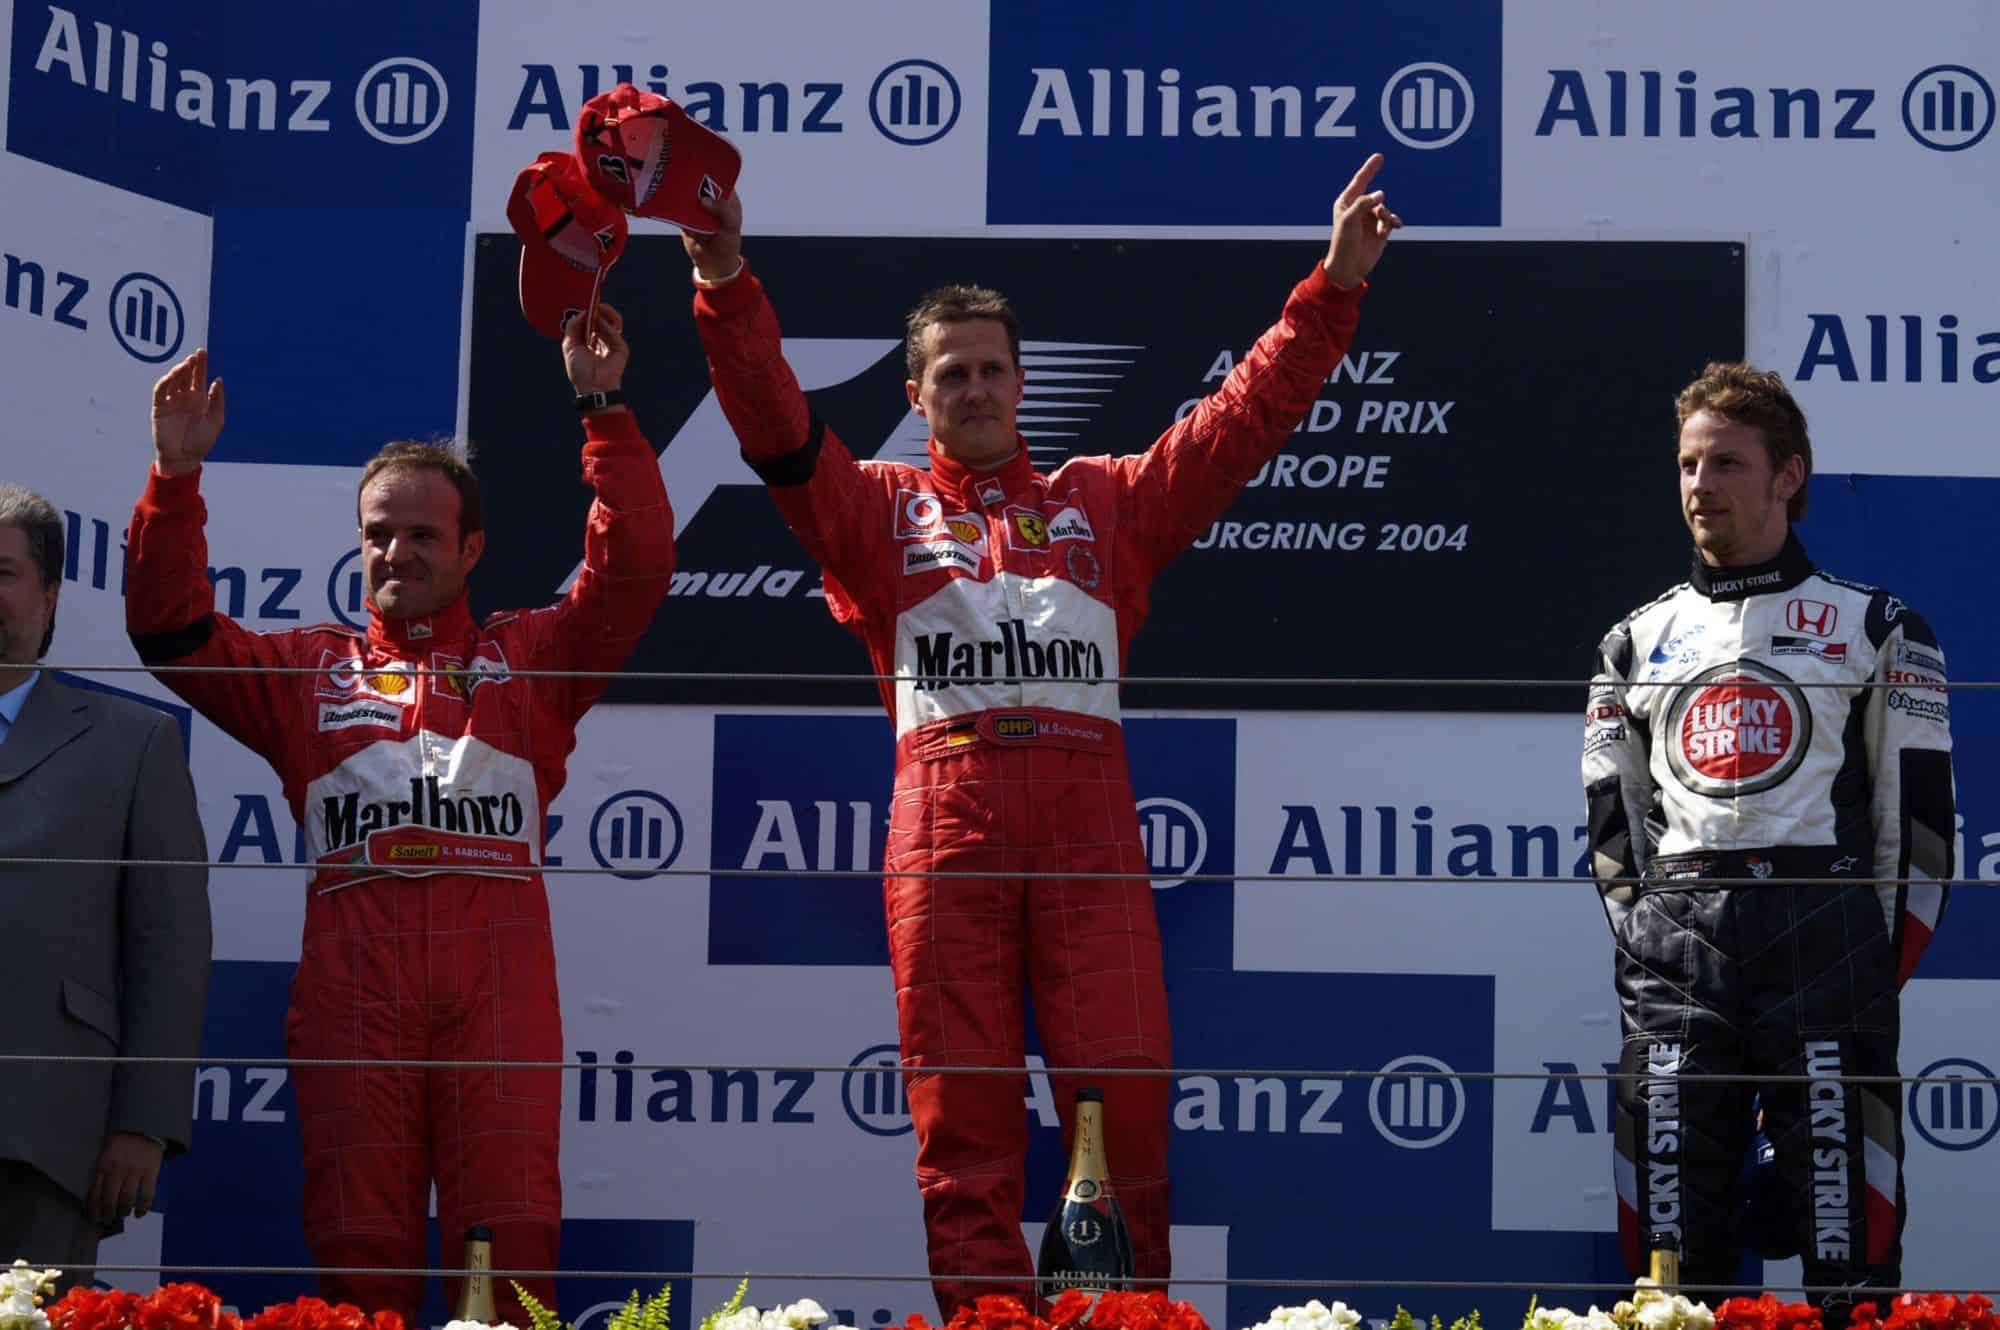 European-GP-F1-2004-Nurburgring-podium-Schumacher-Barrichello-Button-Photo-Ferrari